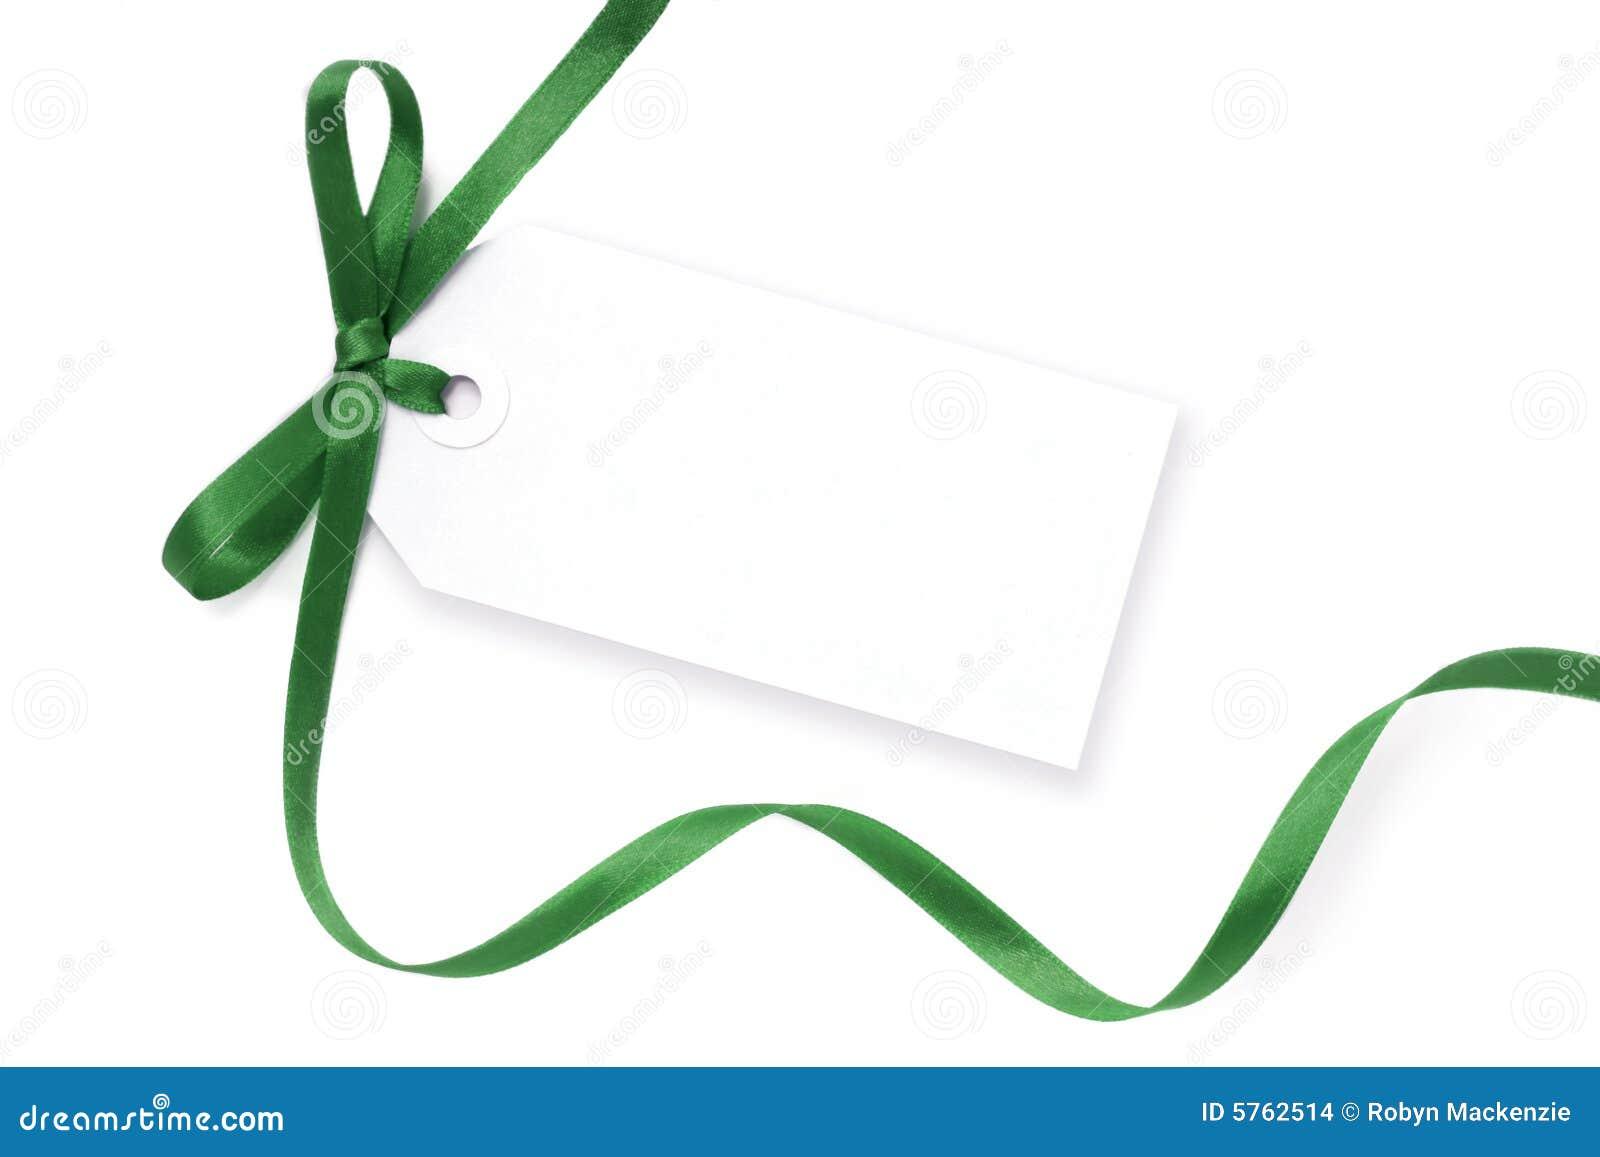 Blank Tag with Green Ribbon